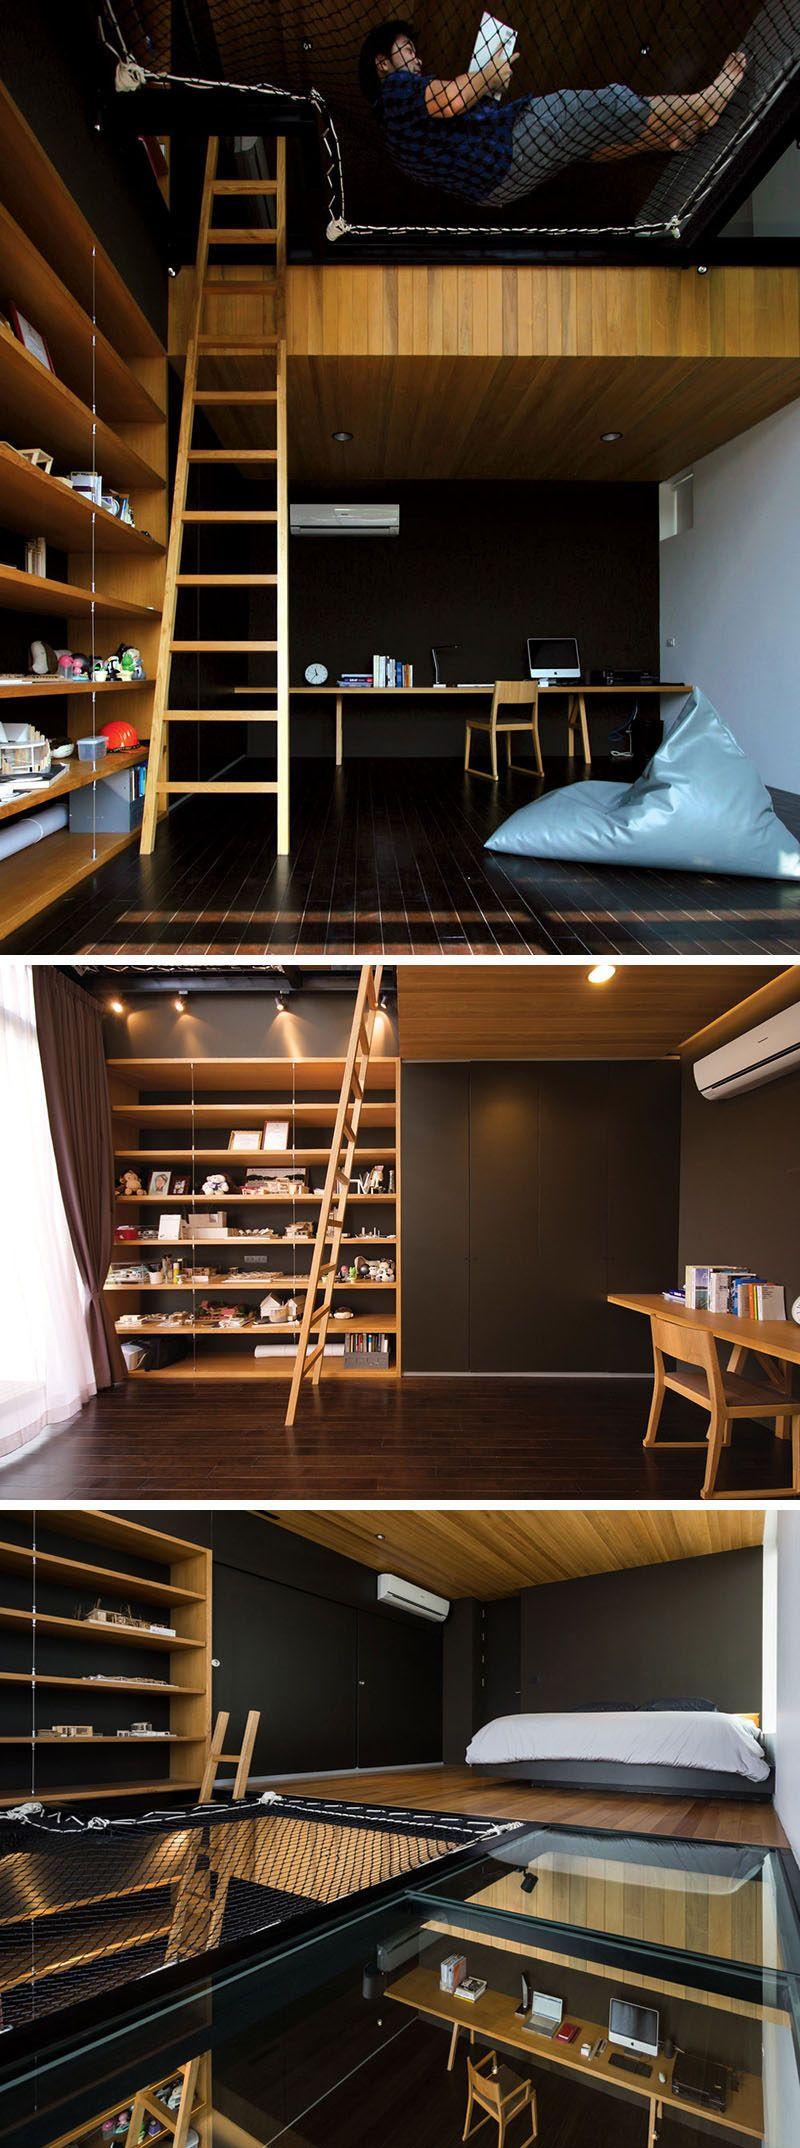 Willkommen zu hause design bilder  inspirational bedroom design ideas for teenagers  dekoration